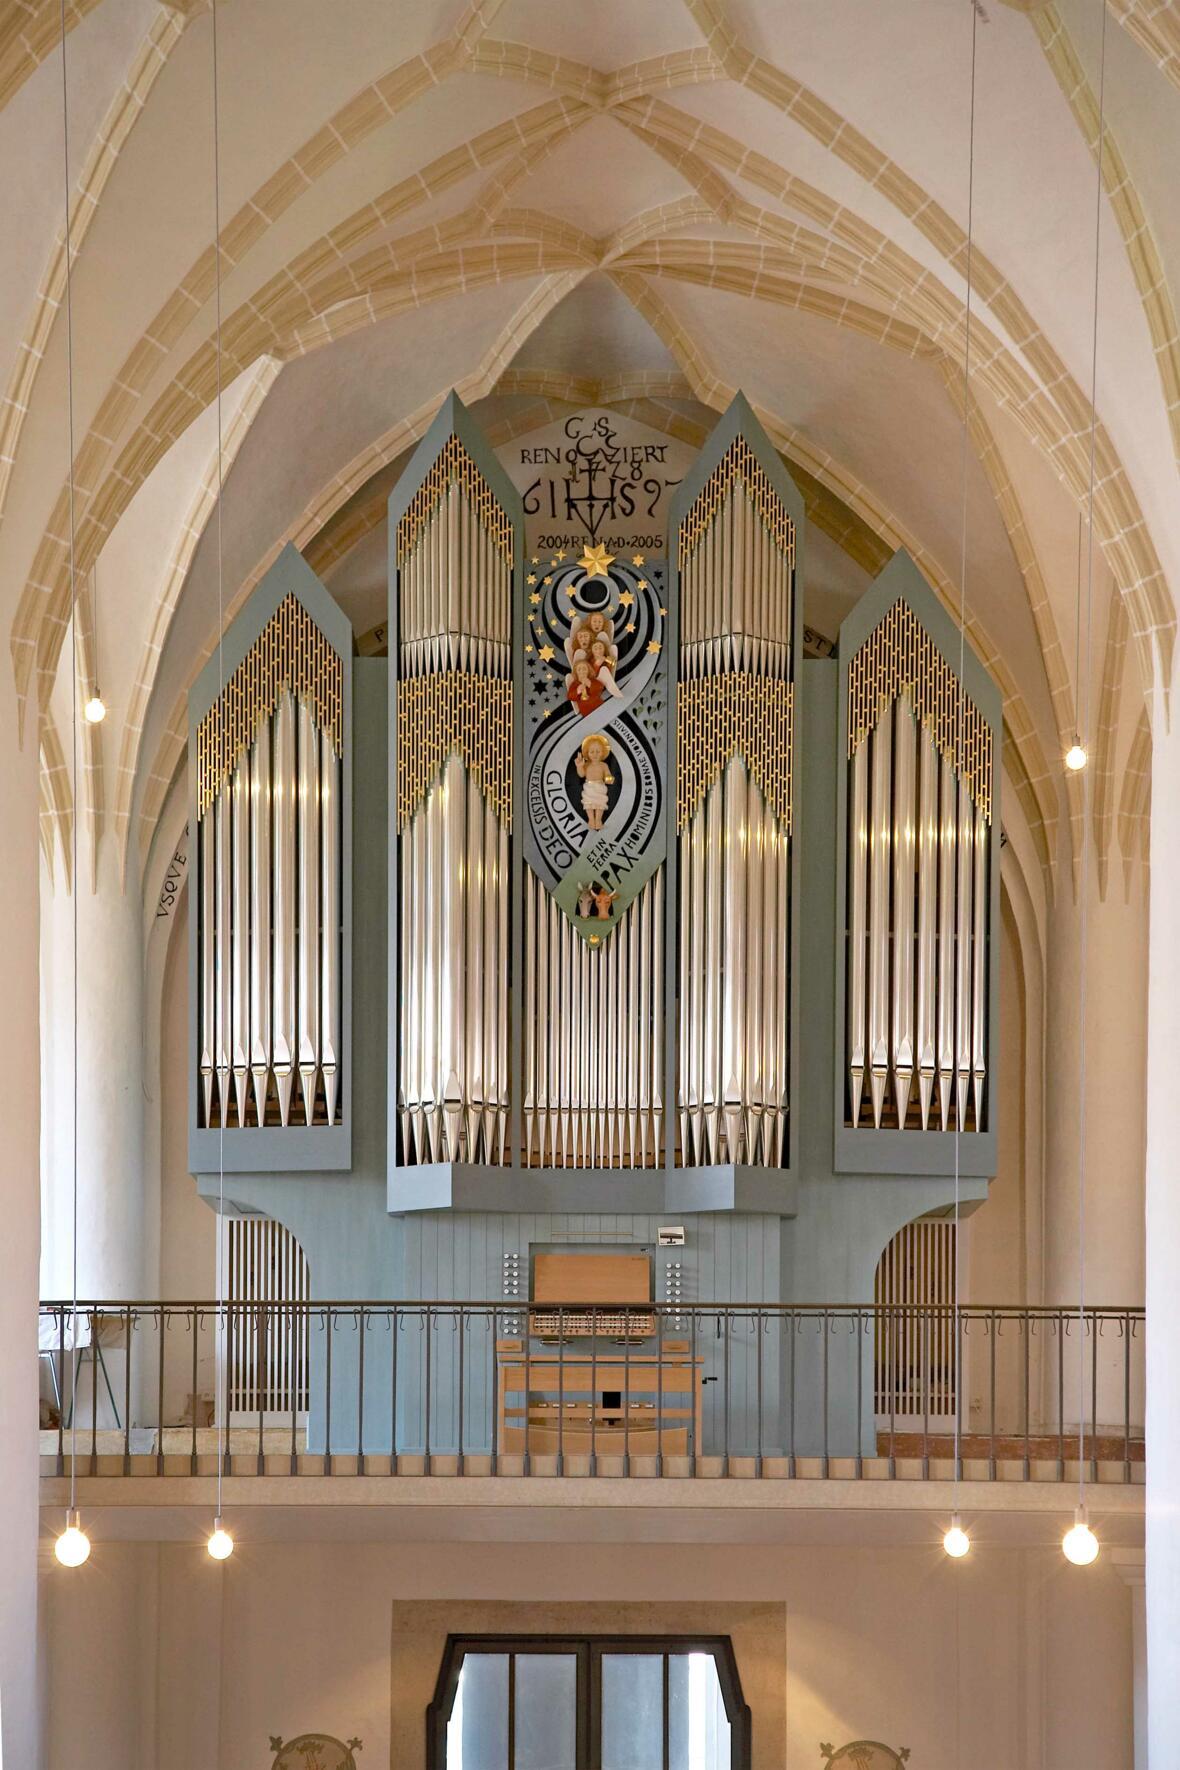 Orgel Schrobenhausen St. Jakobus maj.